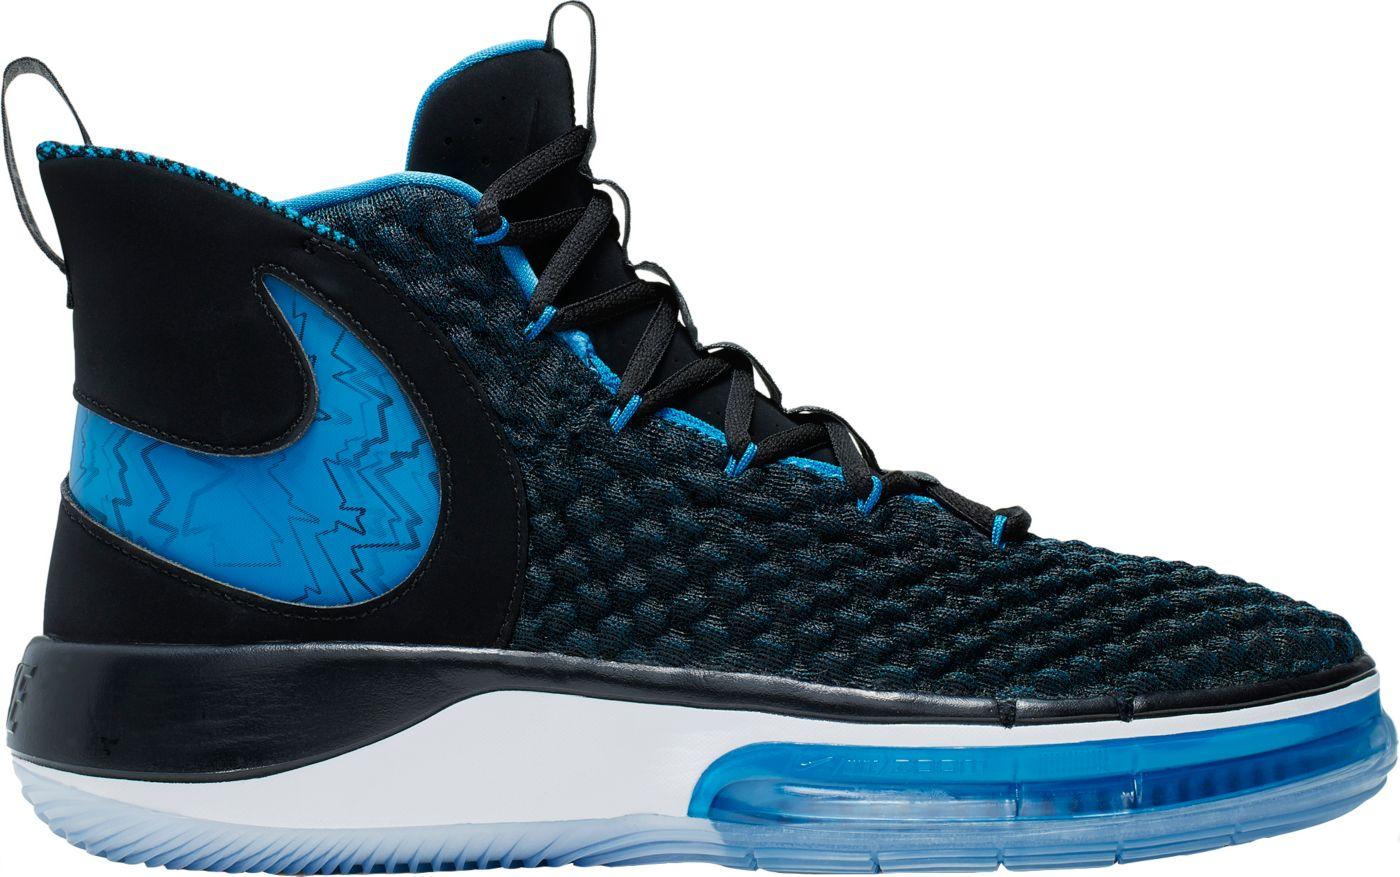 Nike AlphaDunk Basketball Shoes